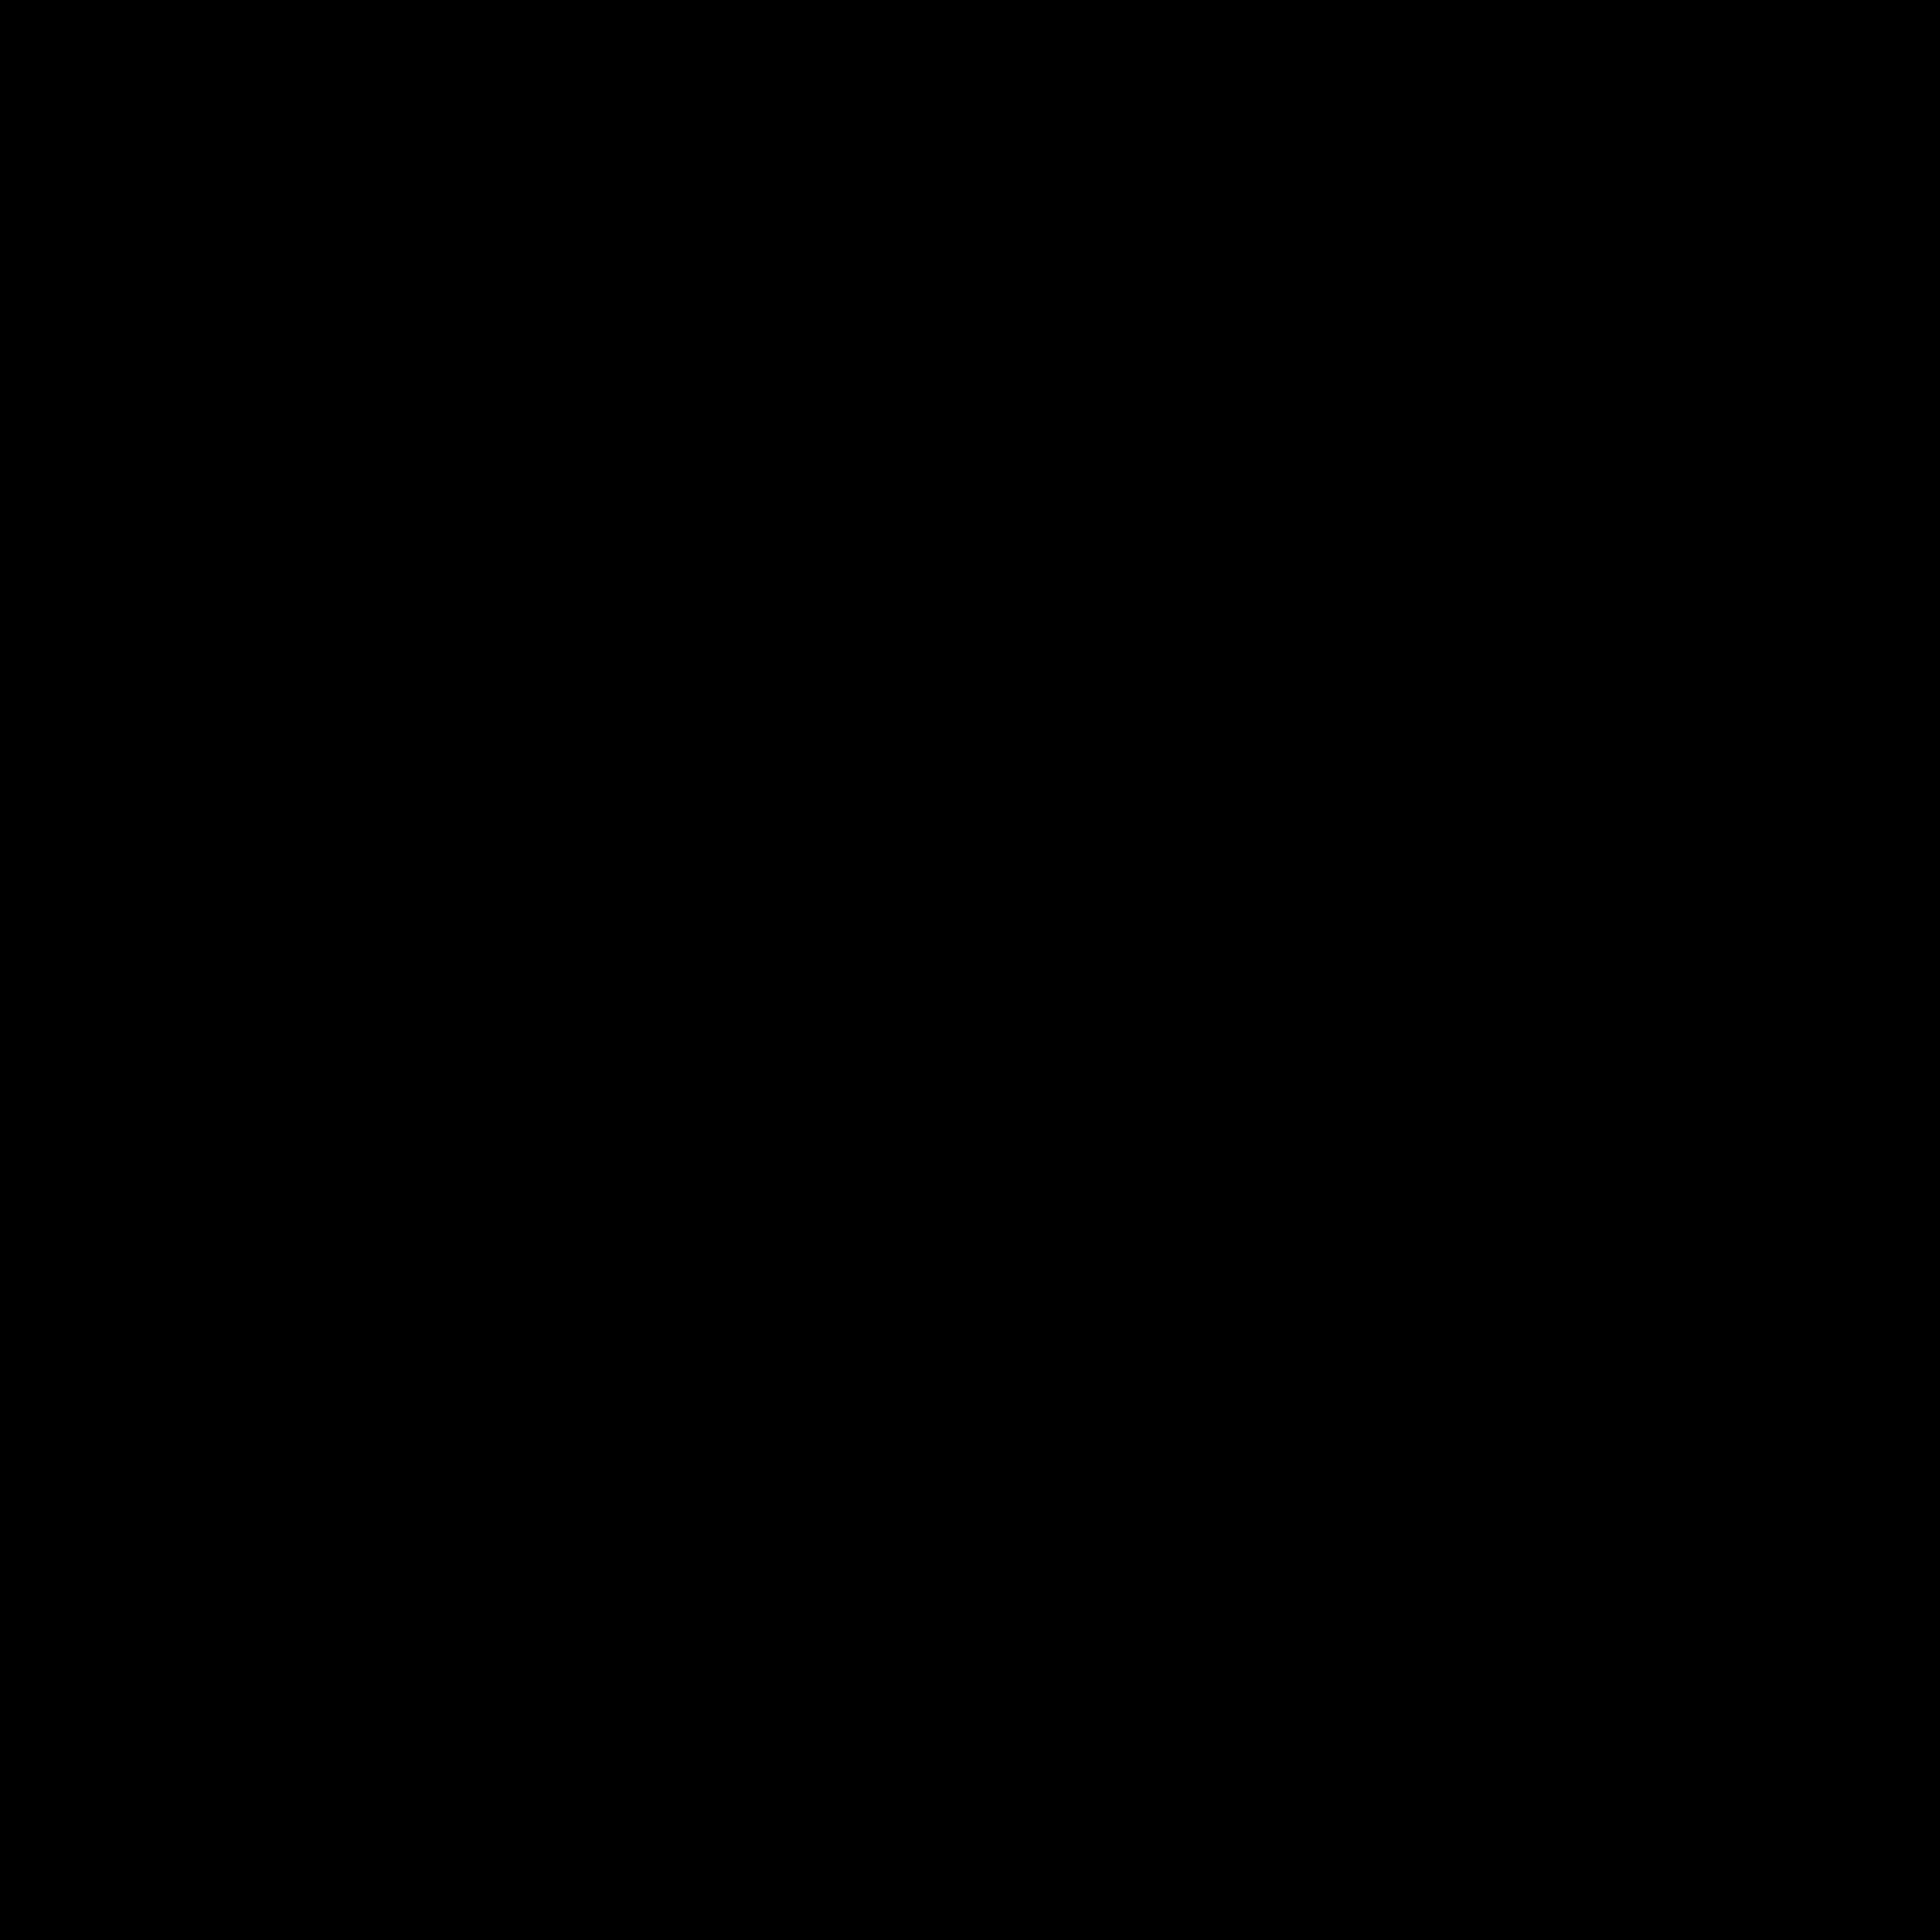 Clipart sunshine icon. Sunrays big image png